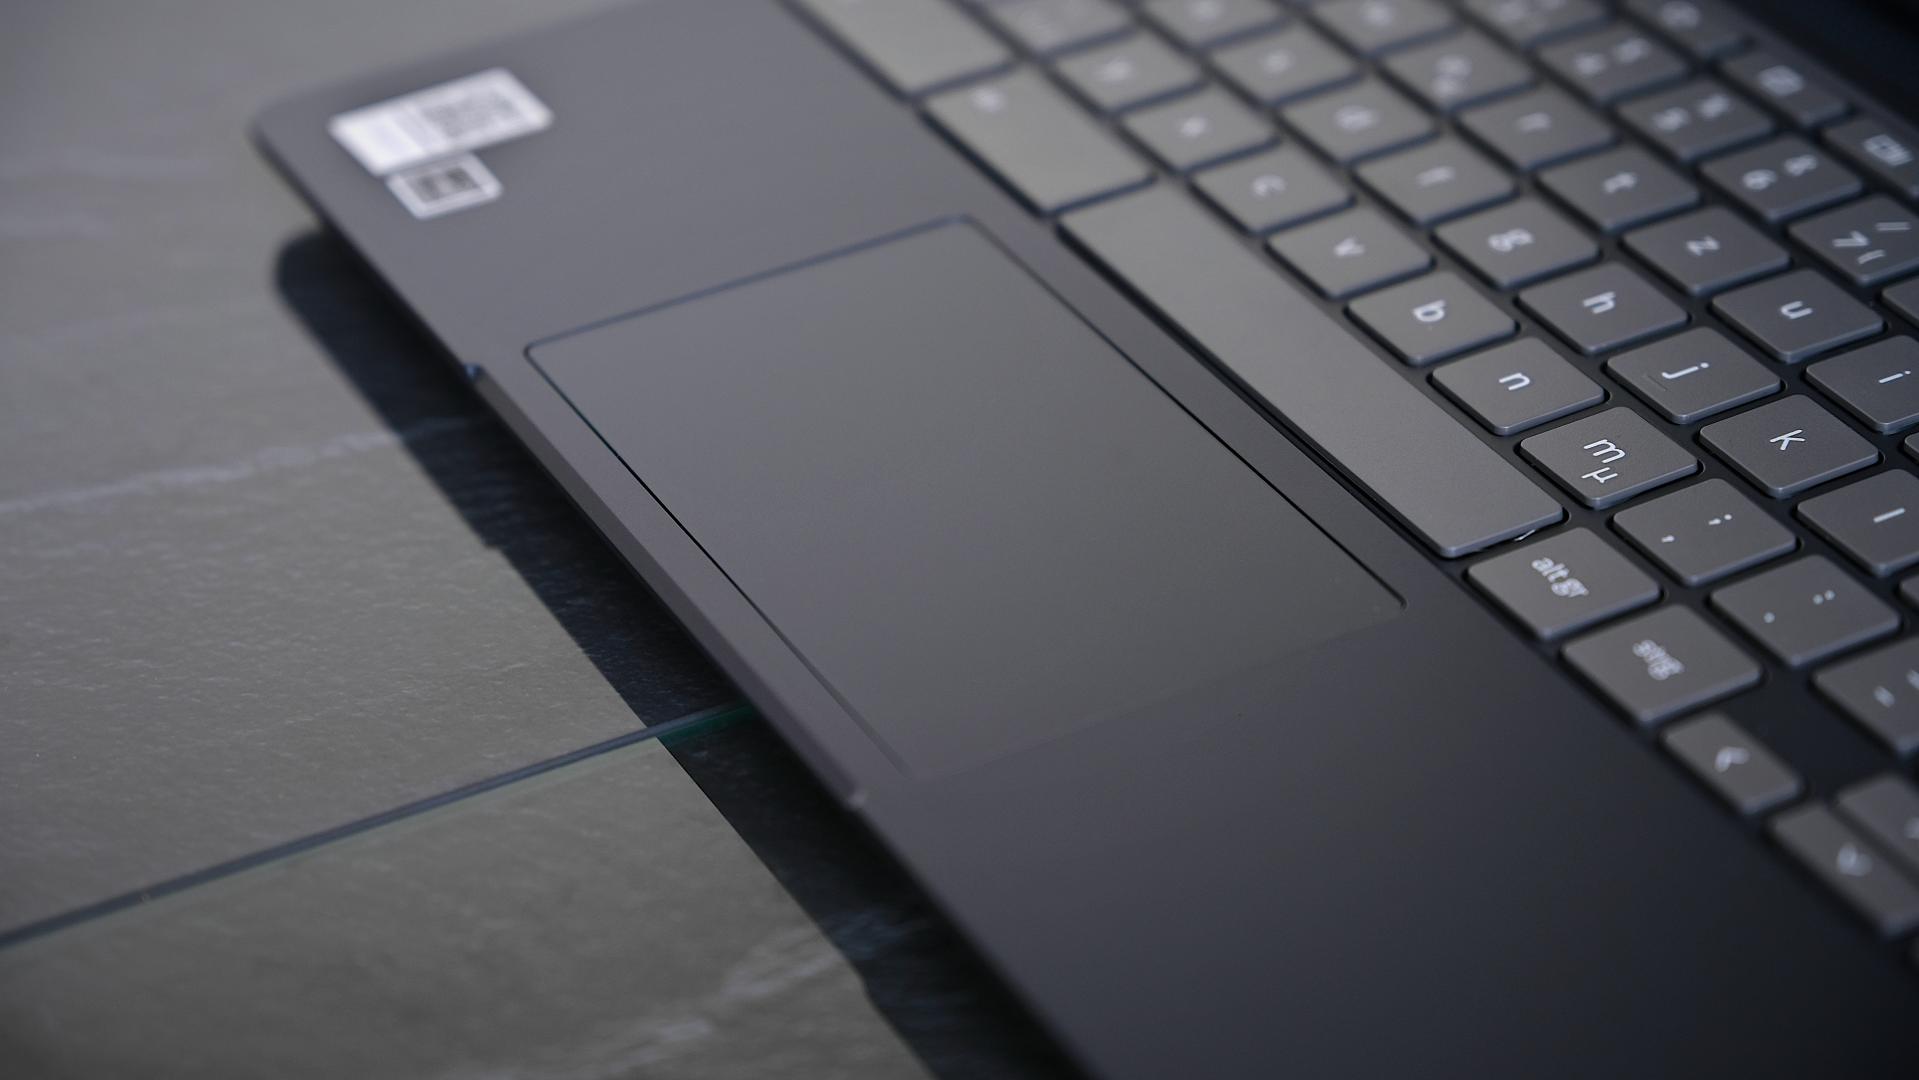 Flex 3 Chromebook touchpad